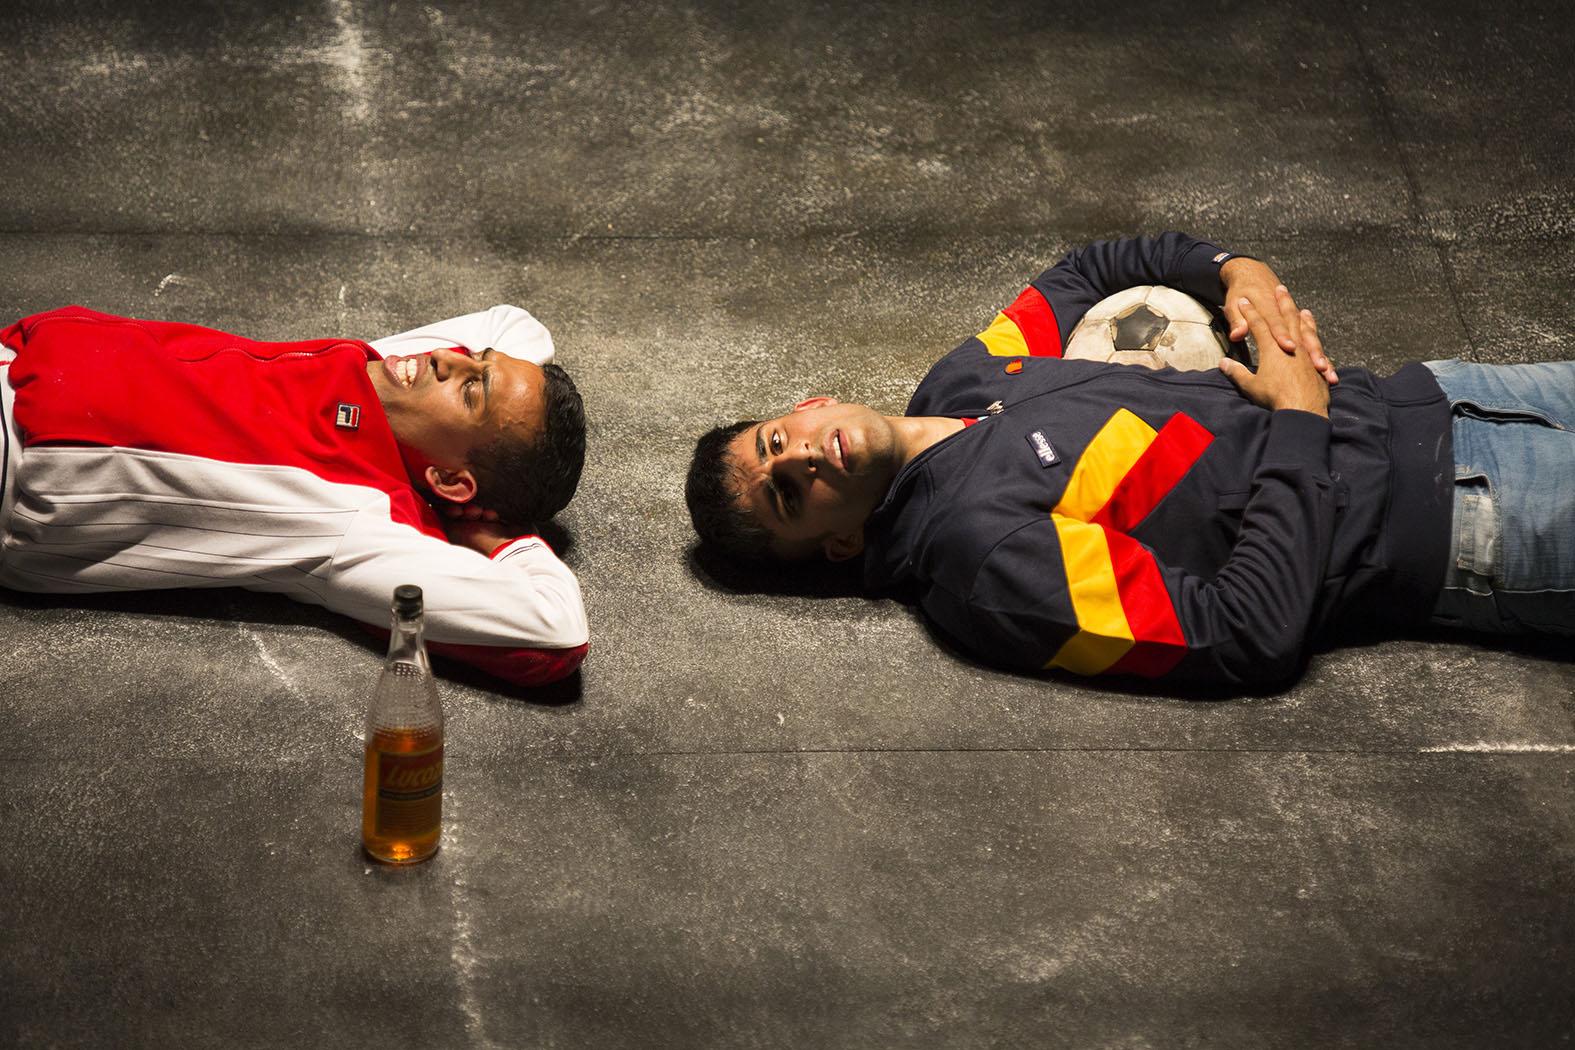 (L-R) Jay Varsani (Riaz) and Hareet Deol